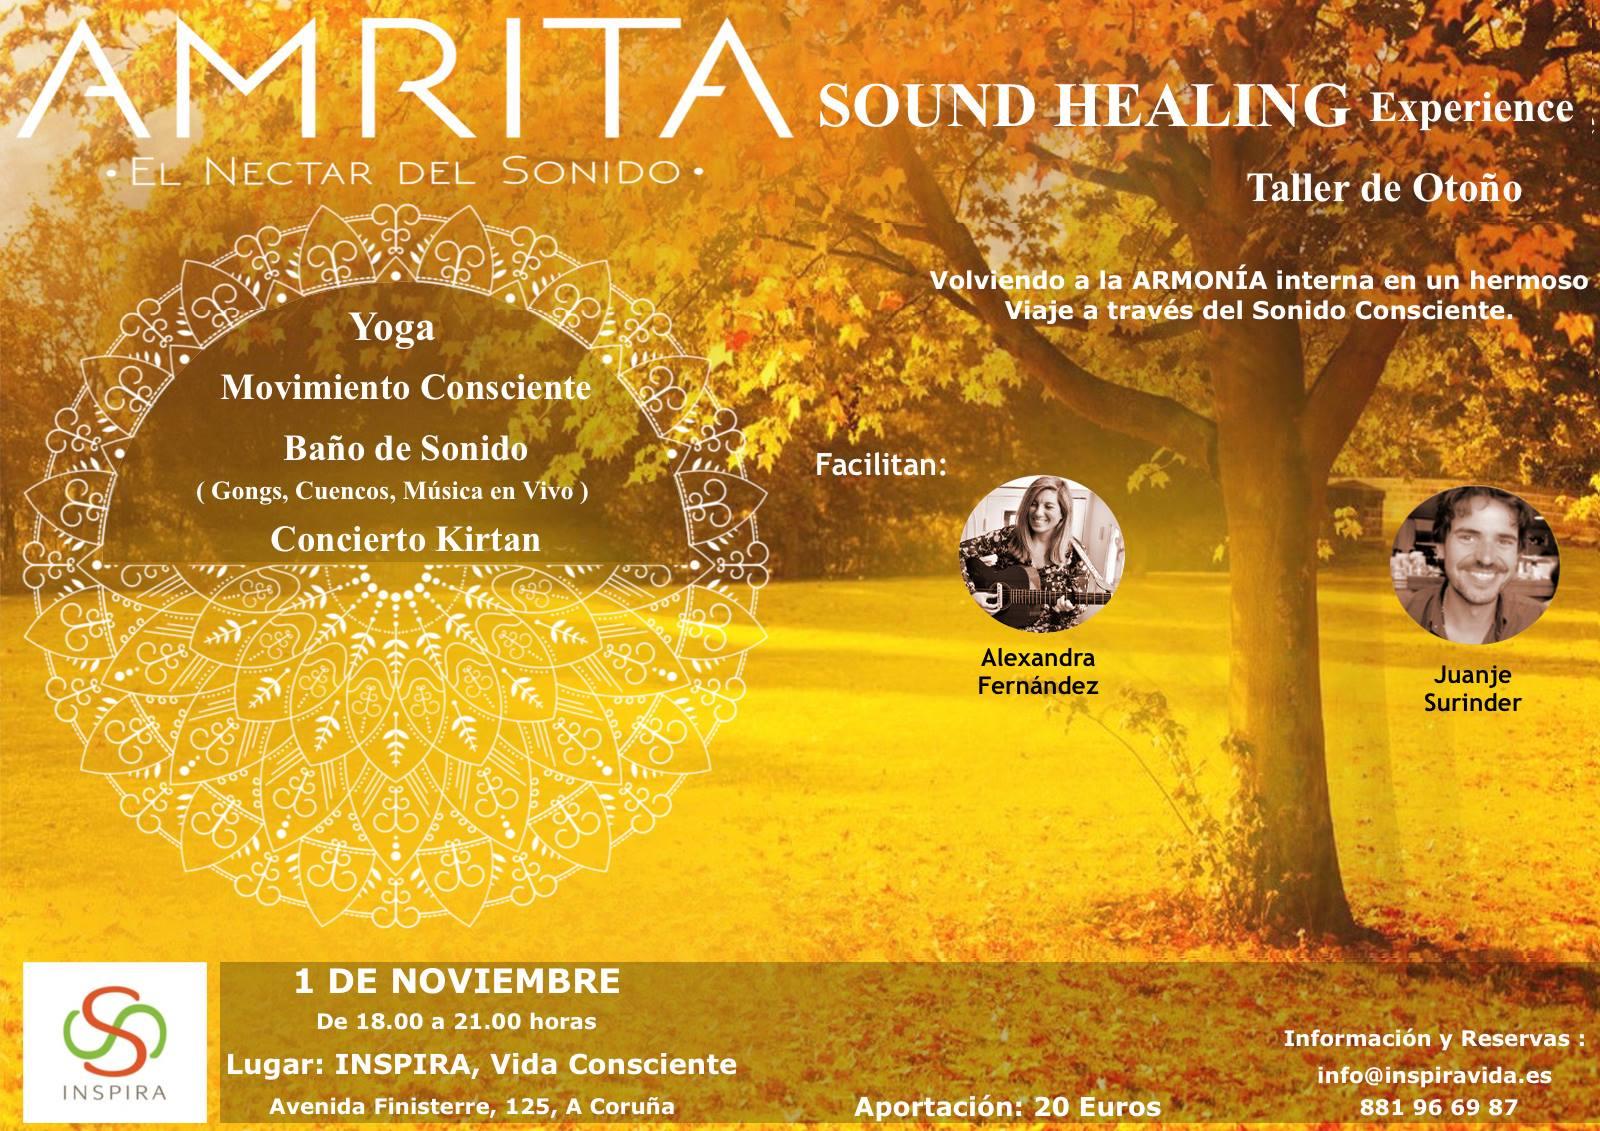 AMRITA Sound Healing